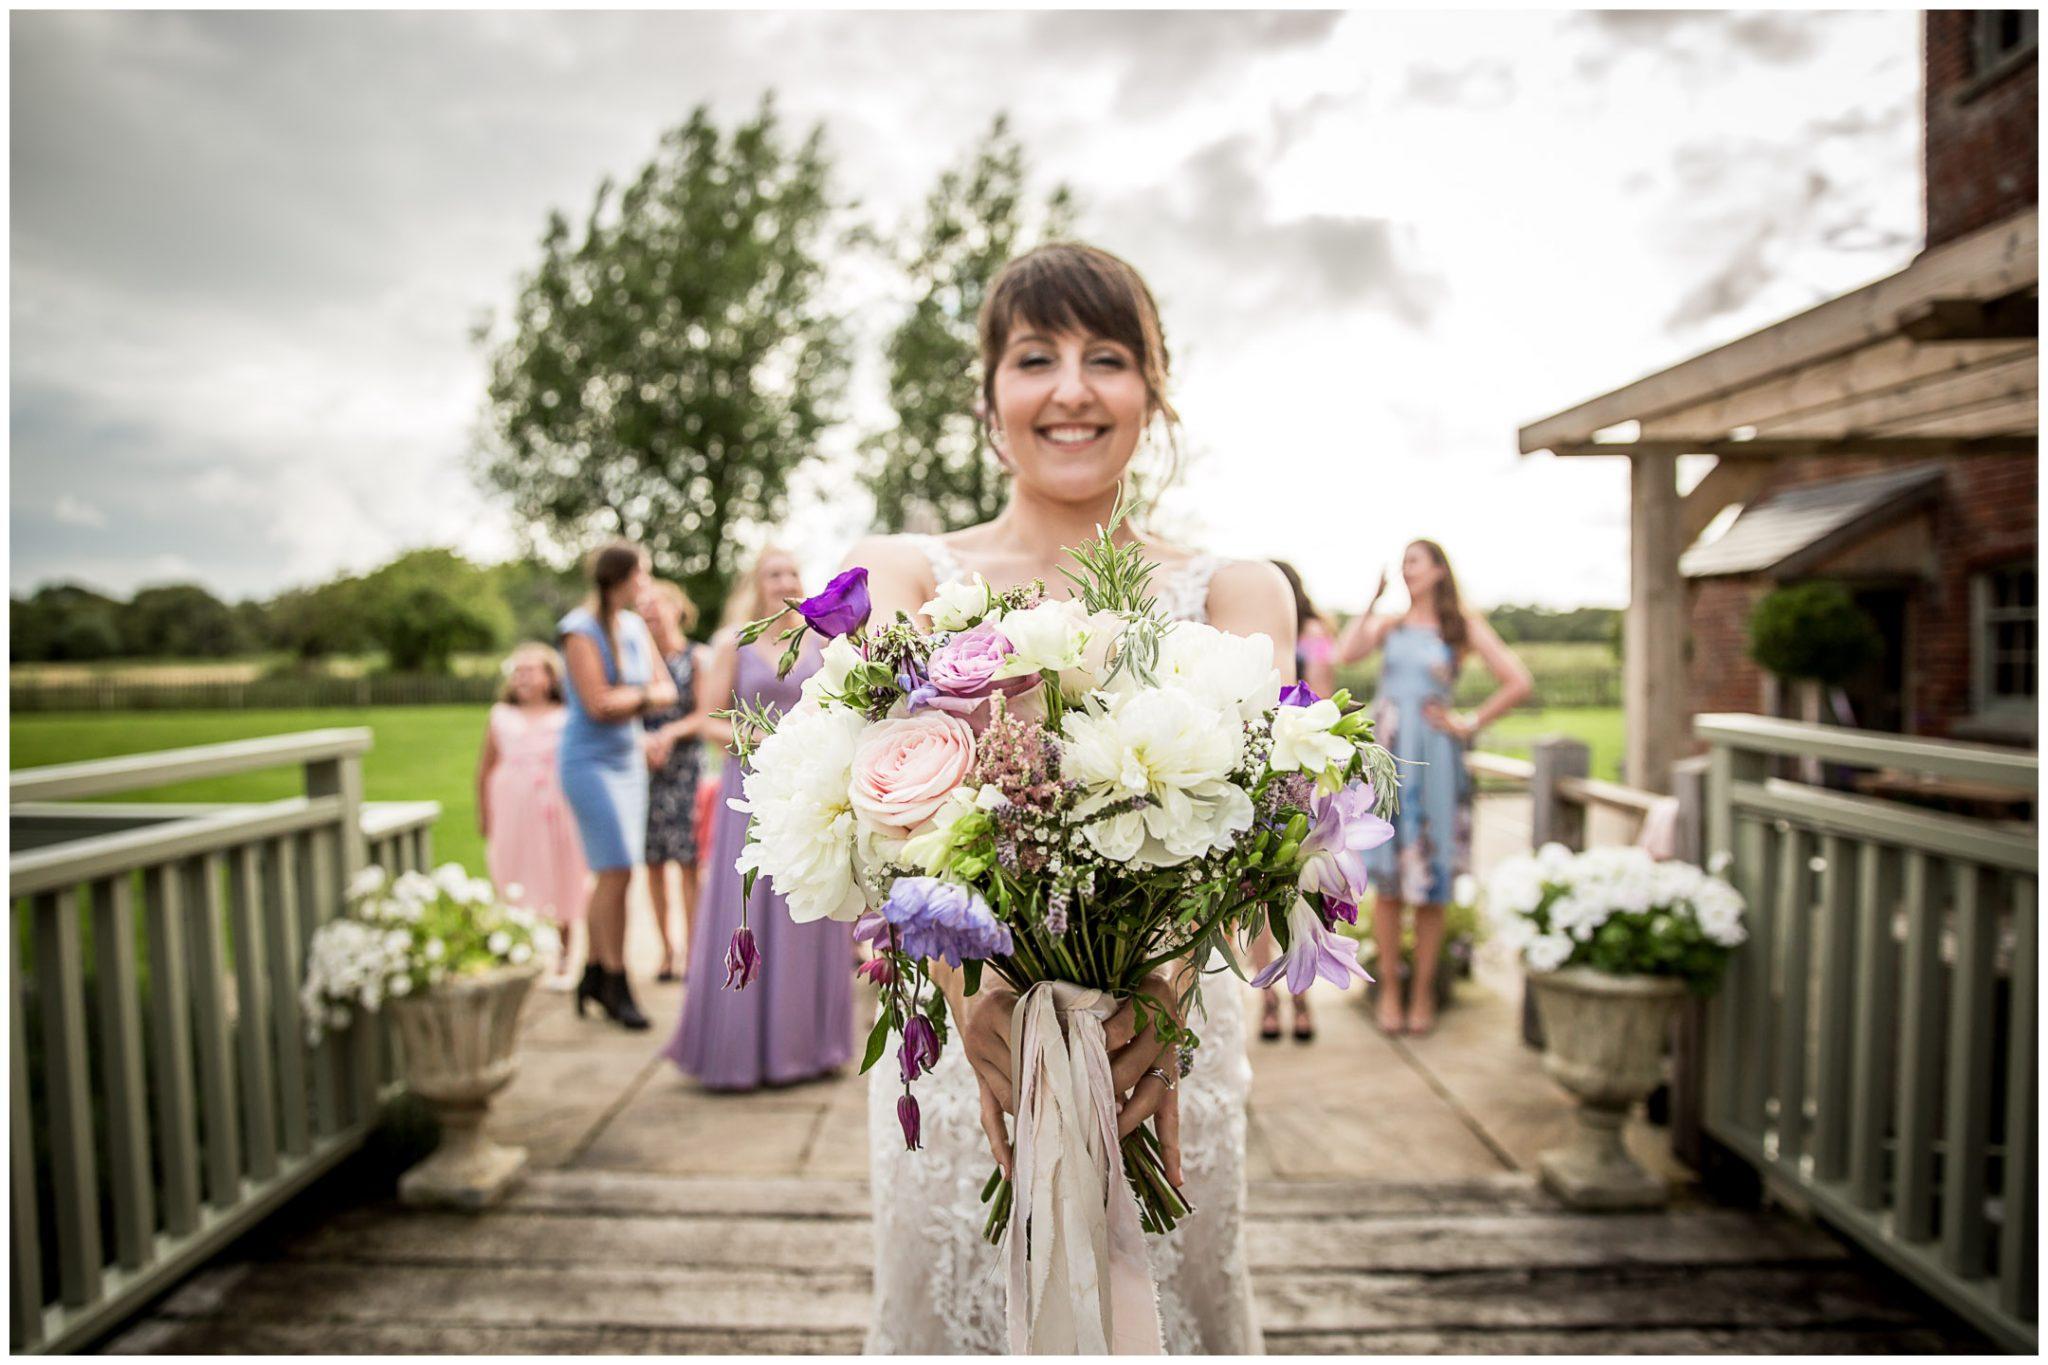 Sopley Mill wedding photography bride prepares to throw bouquet